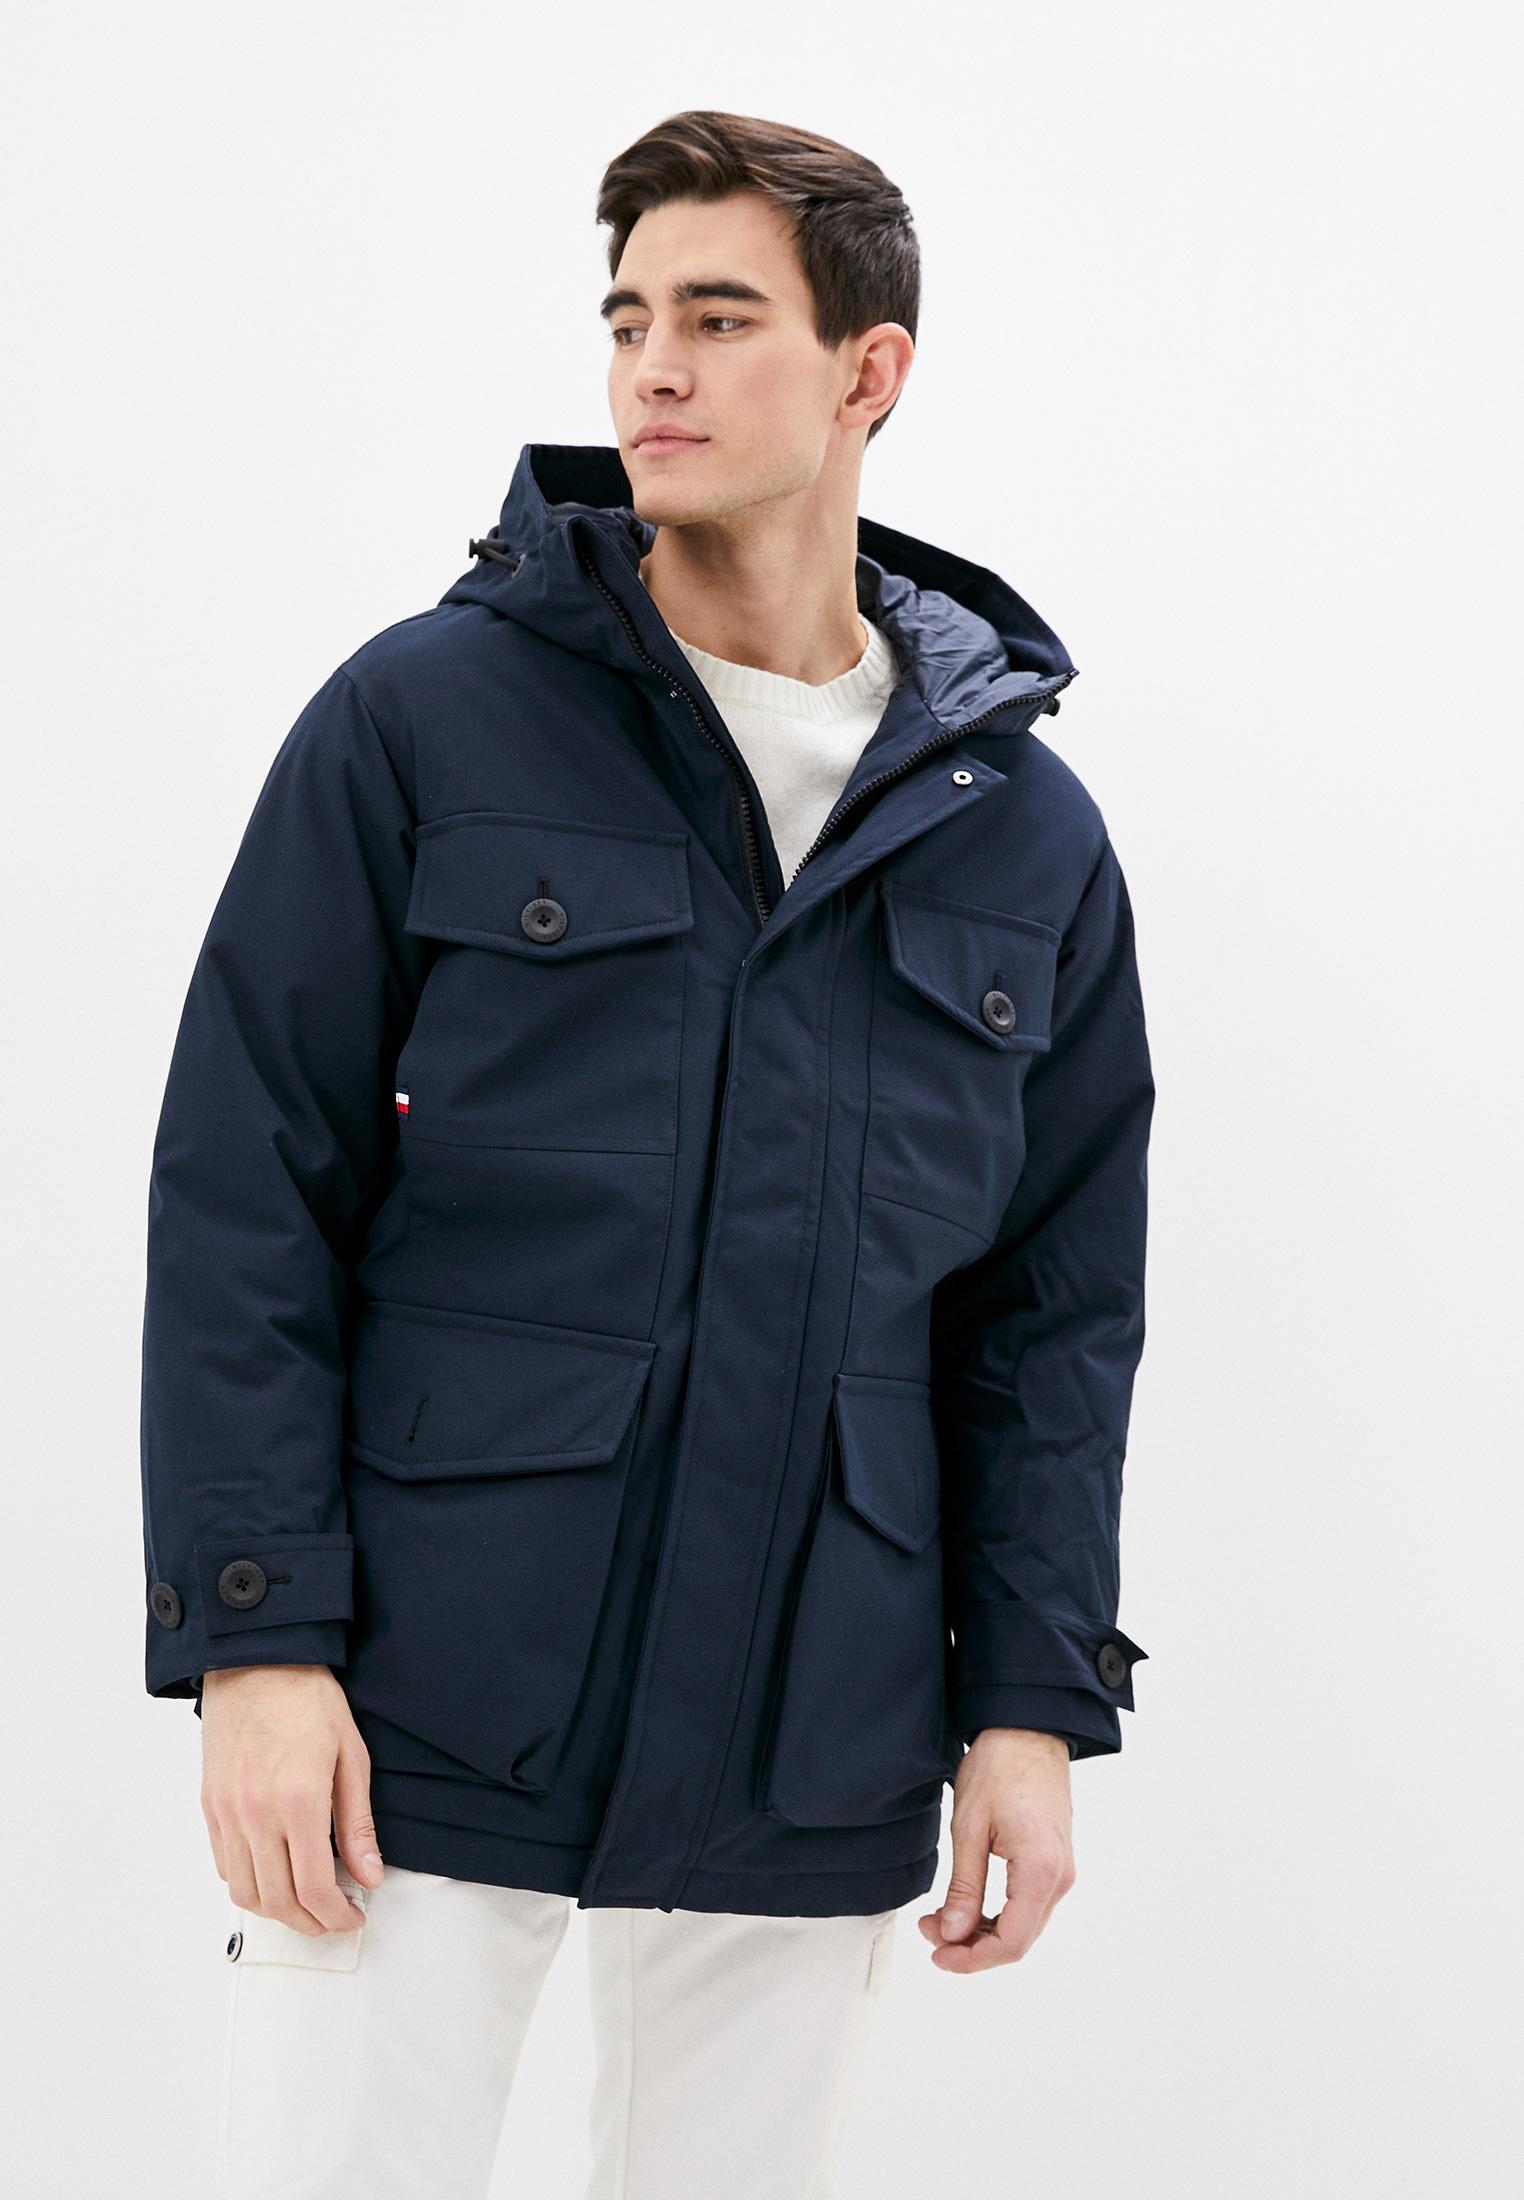 Утепленная куртка Tommy Hilfiger (Томми Хилфигер) Парка Tommy Hilfiger